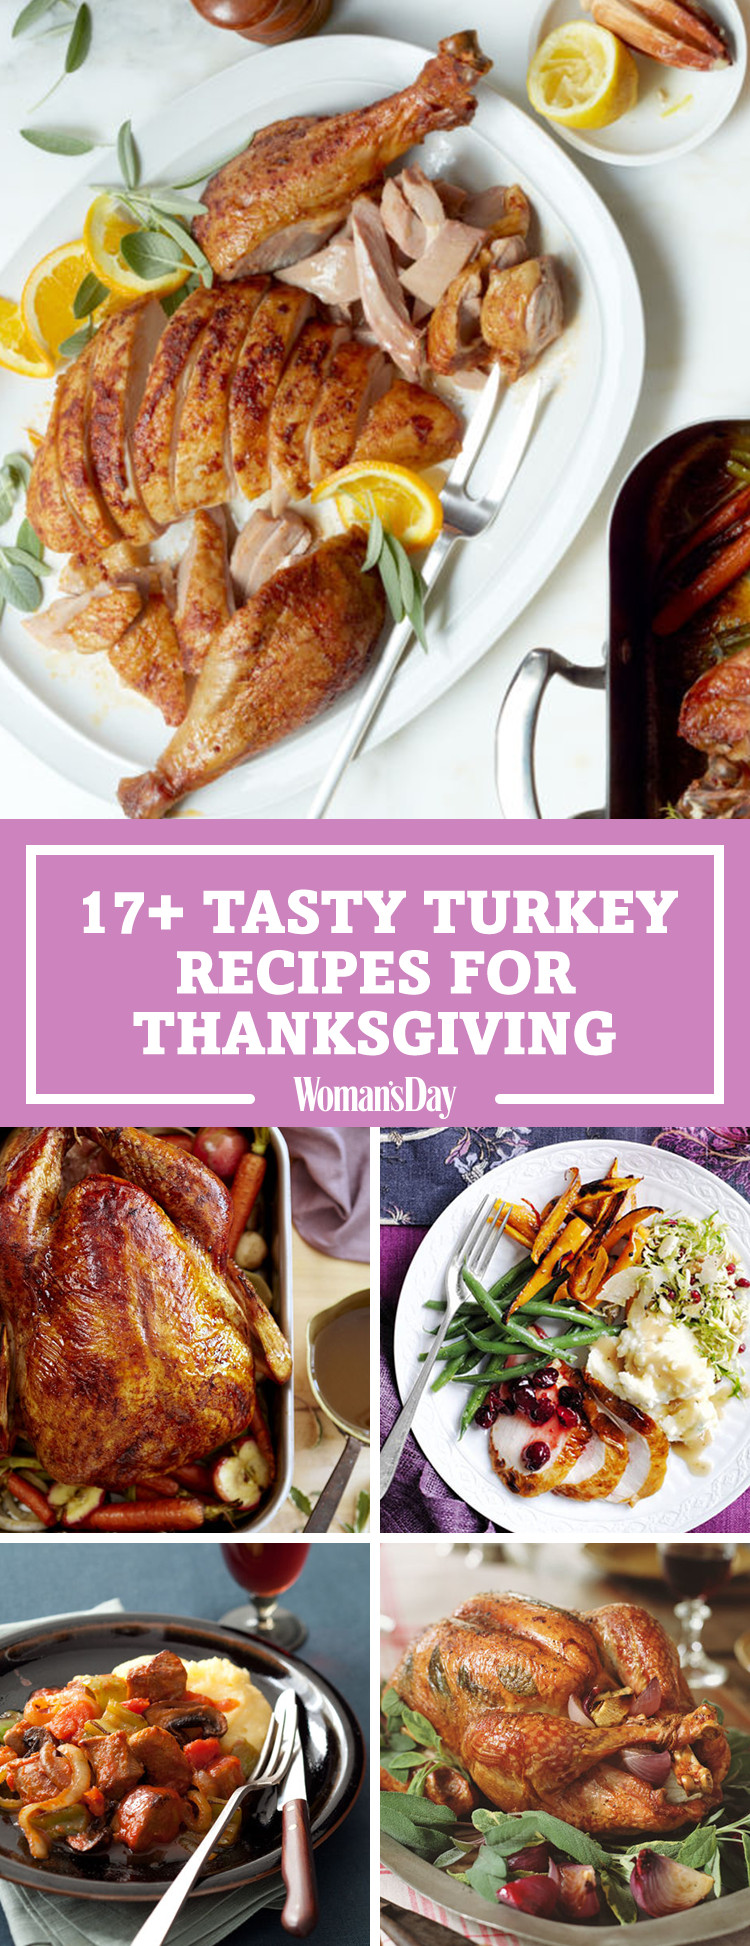 Best Turkey Recipes For Thanksgiving  20 Best Thanksgiving Turkey Recipes Easy Roast Turkey